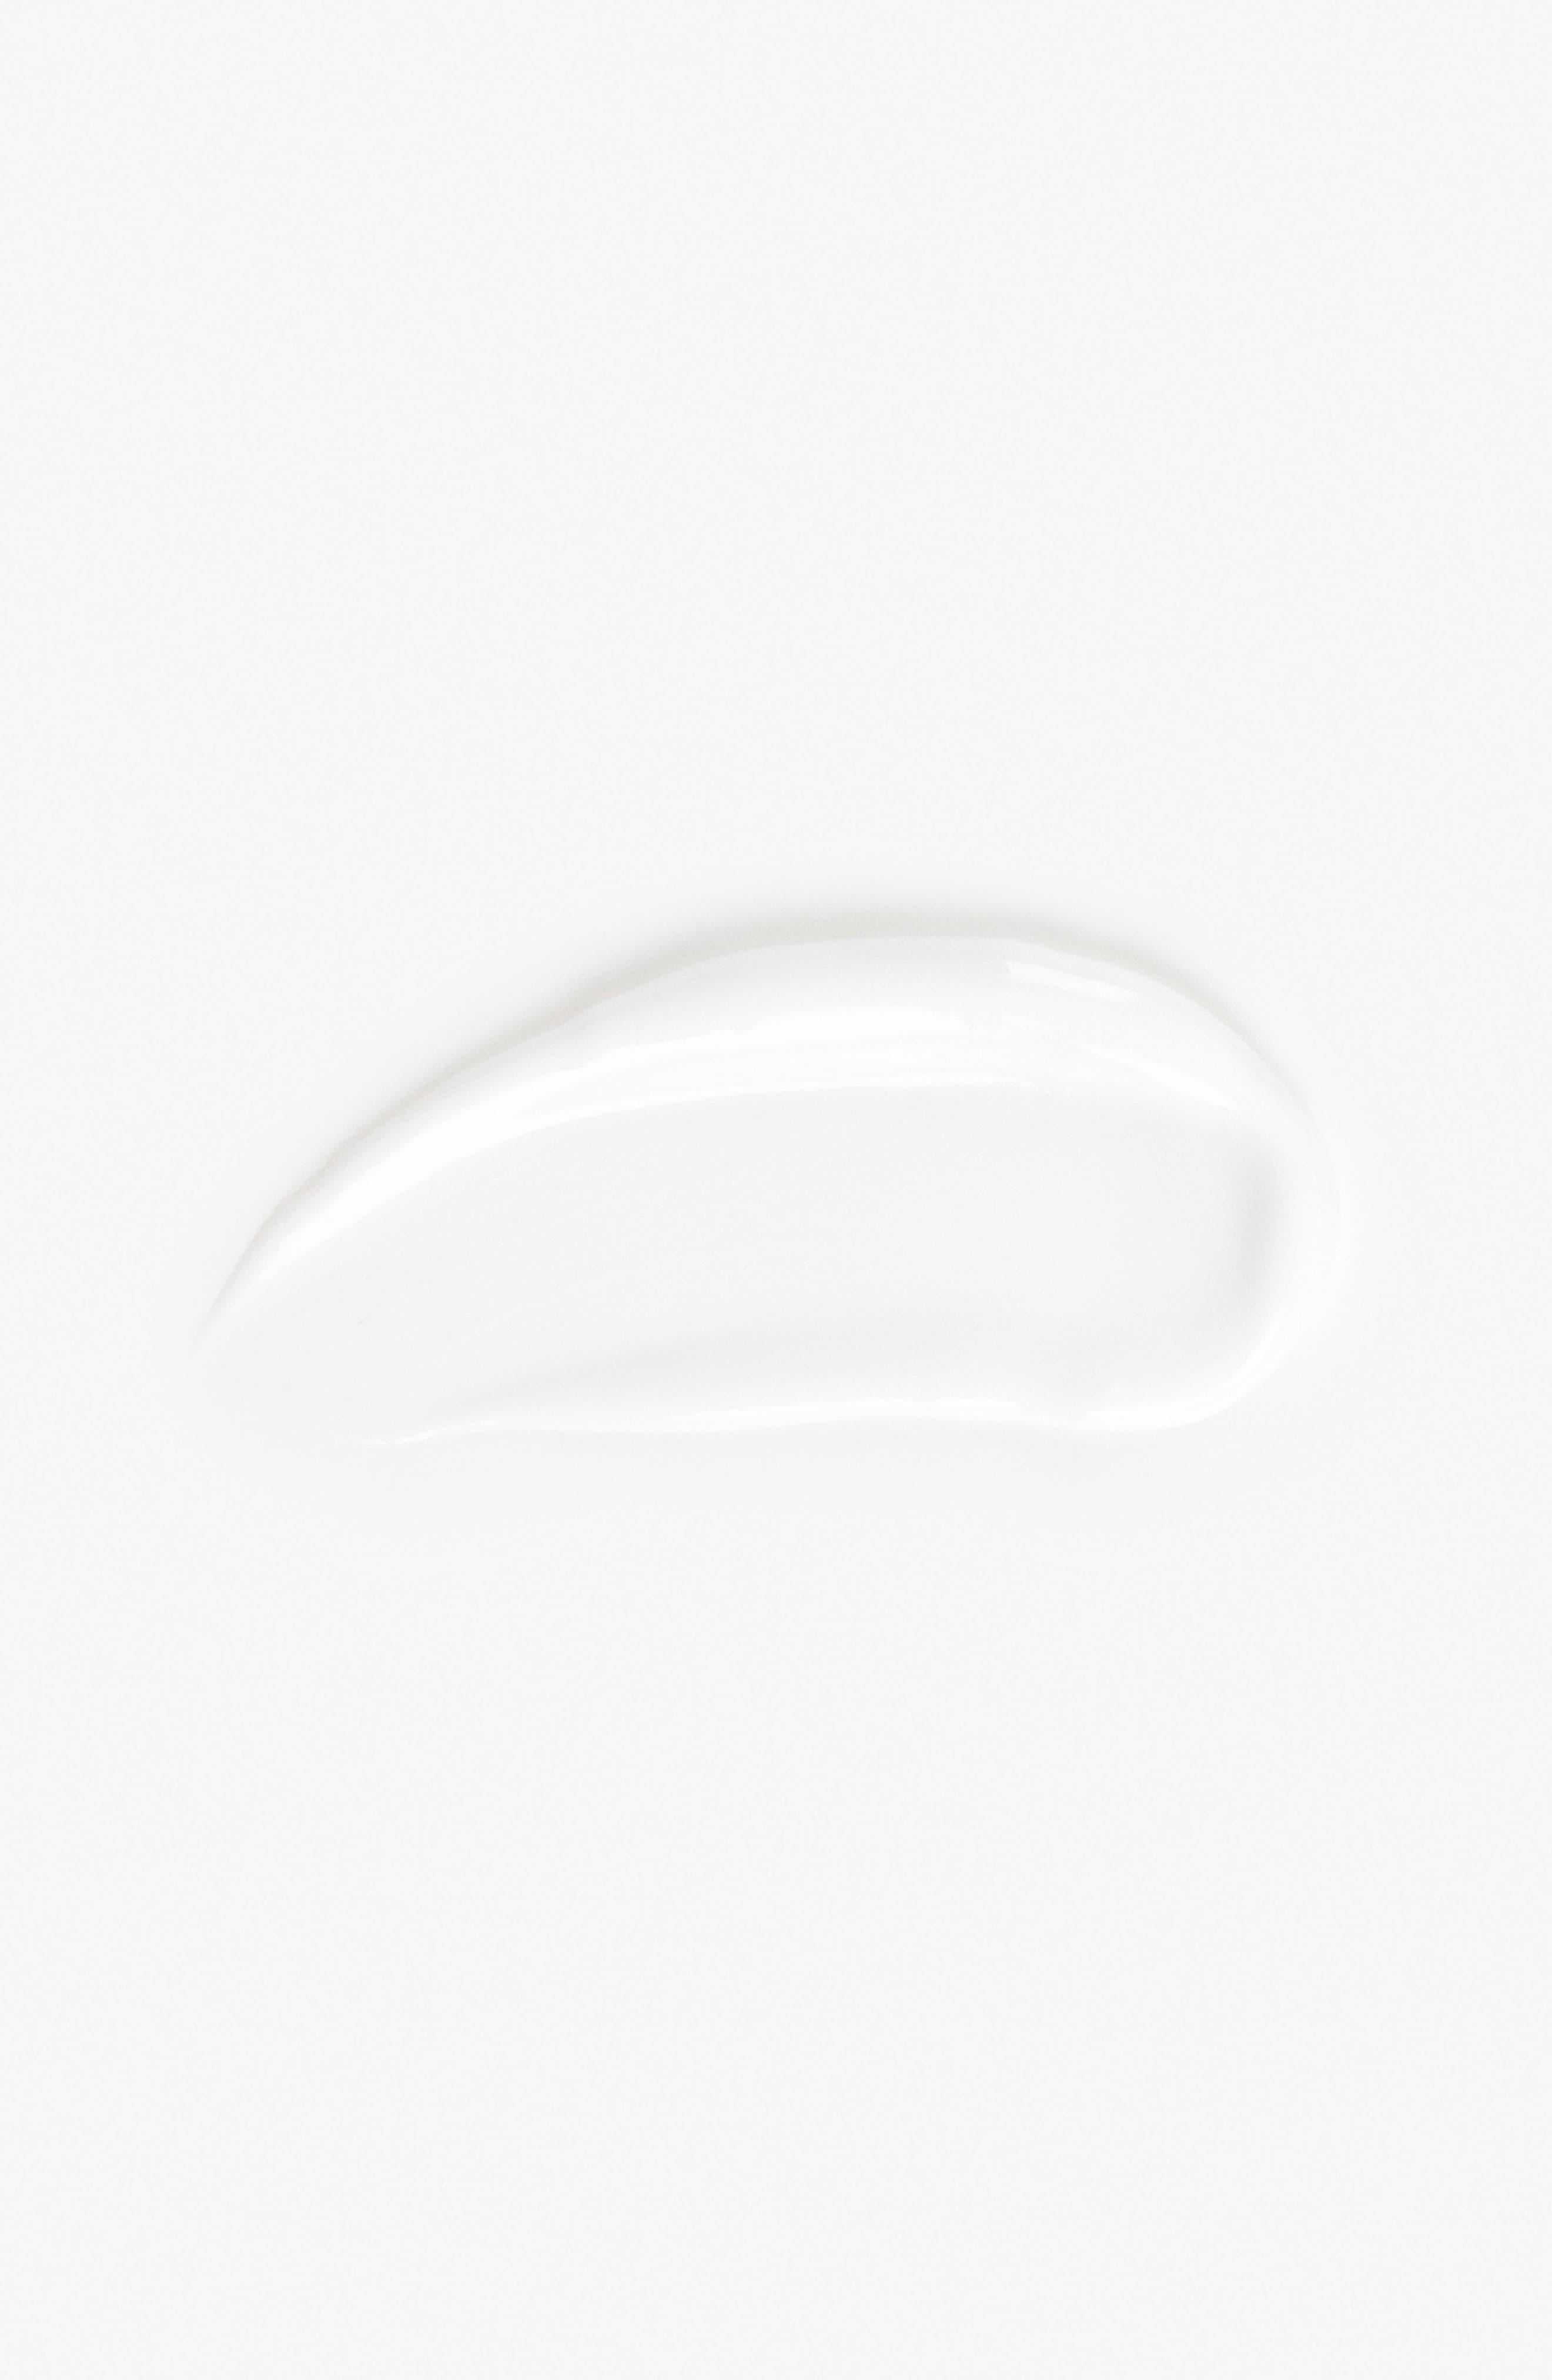 Ultra Facial Moisturizer,                             Alternate thumbnail 2, color,                             NO COLOR